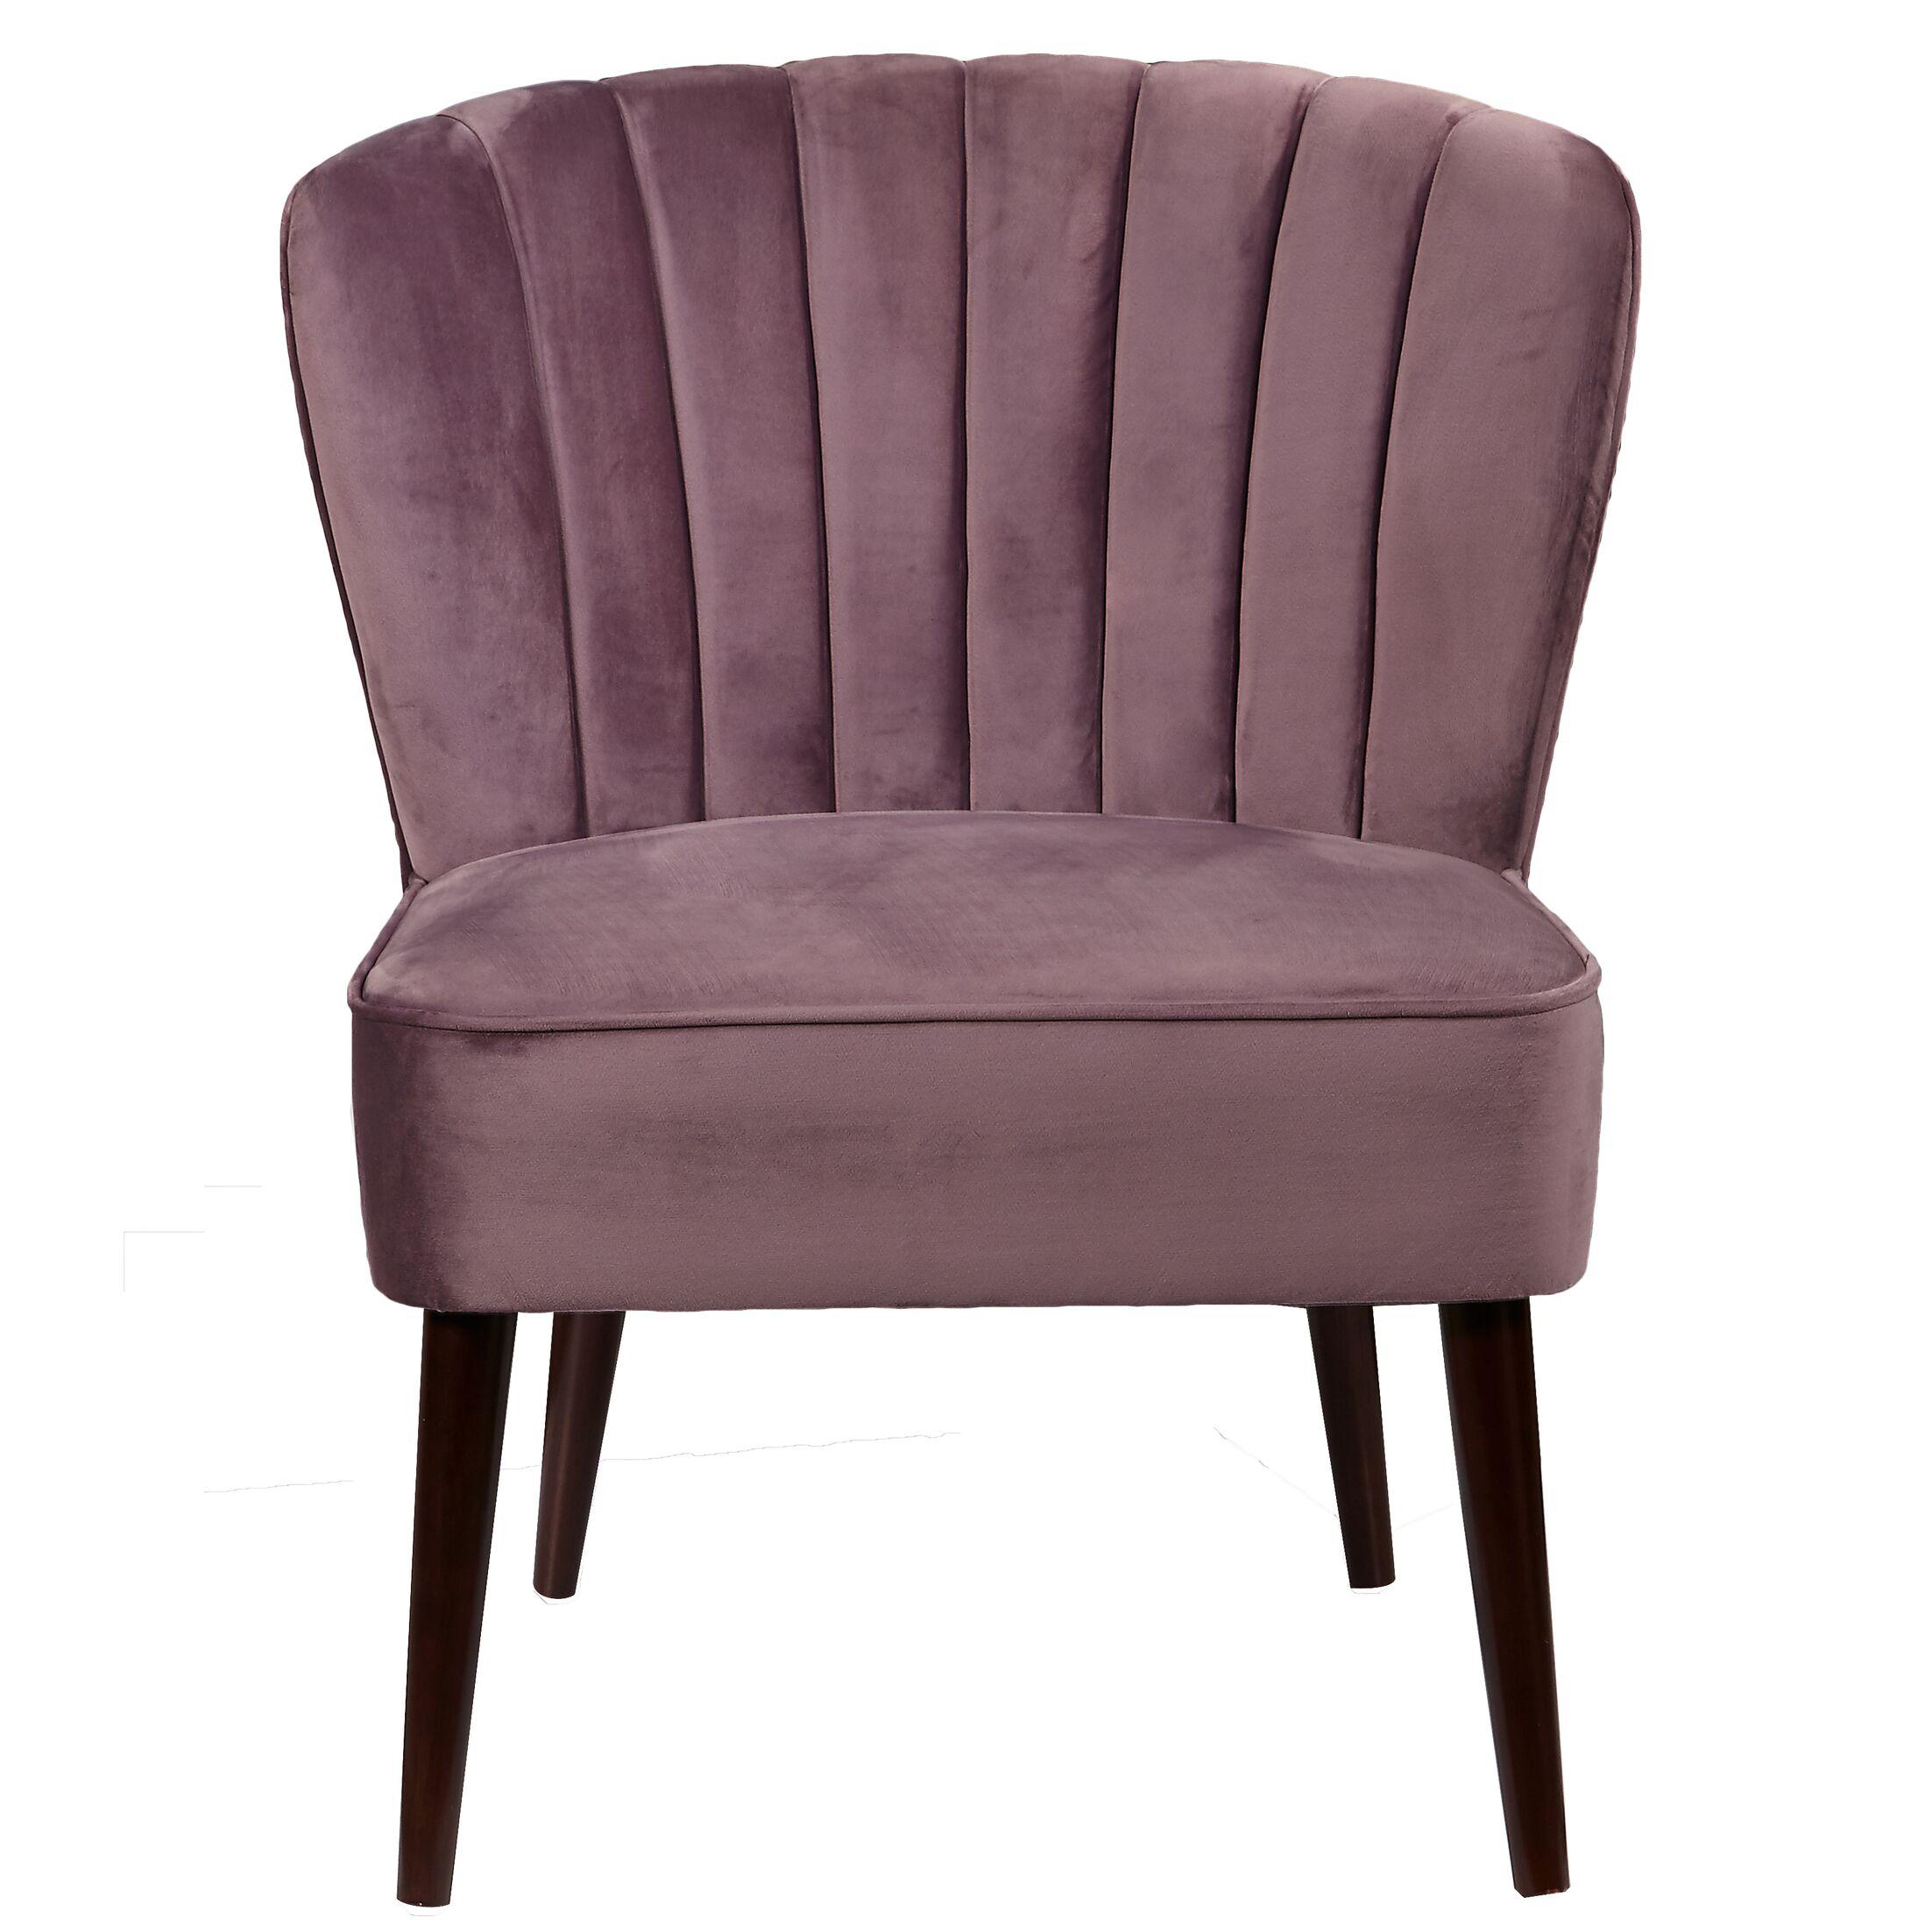 Alchiba Channeled Slipper Chair